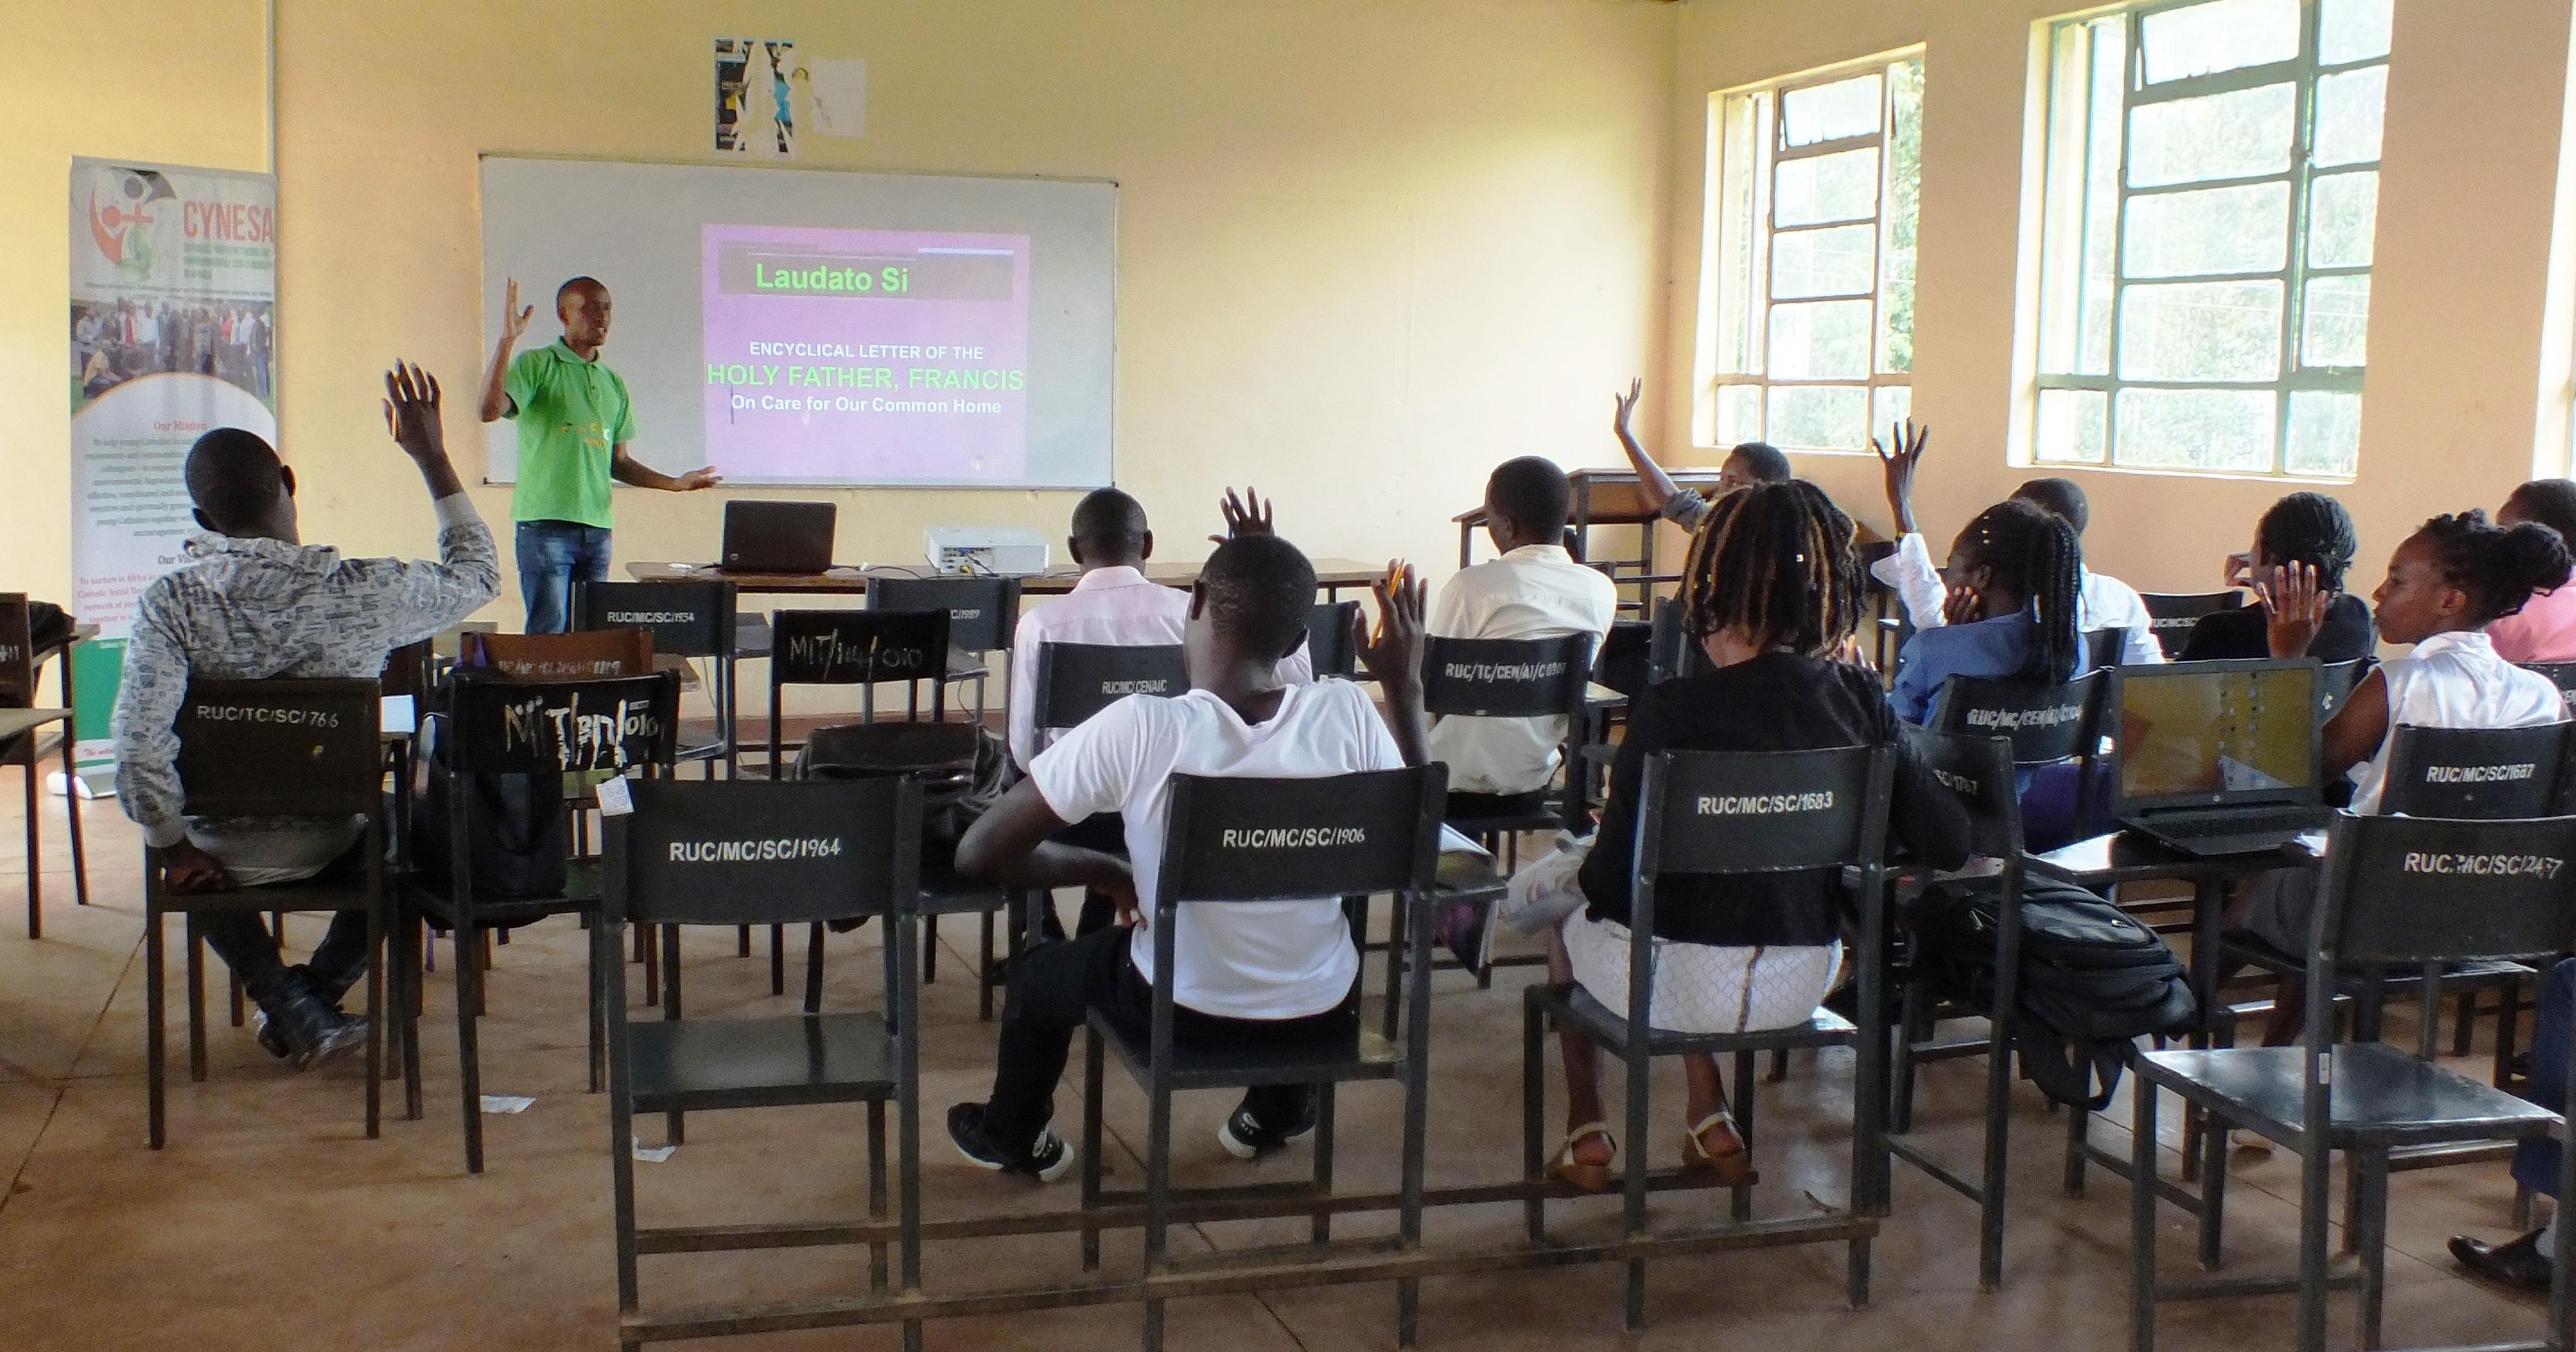 CYNESA-Laudato-Si-Workshop-at-Rongo-University